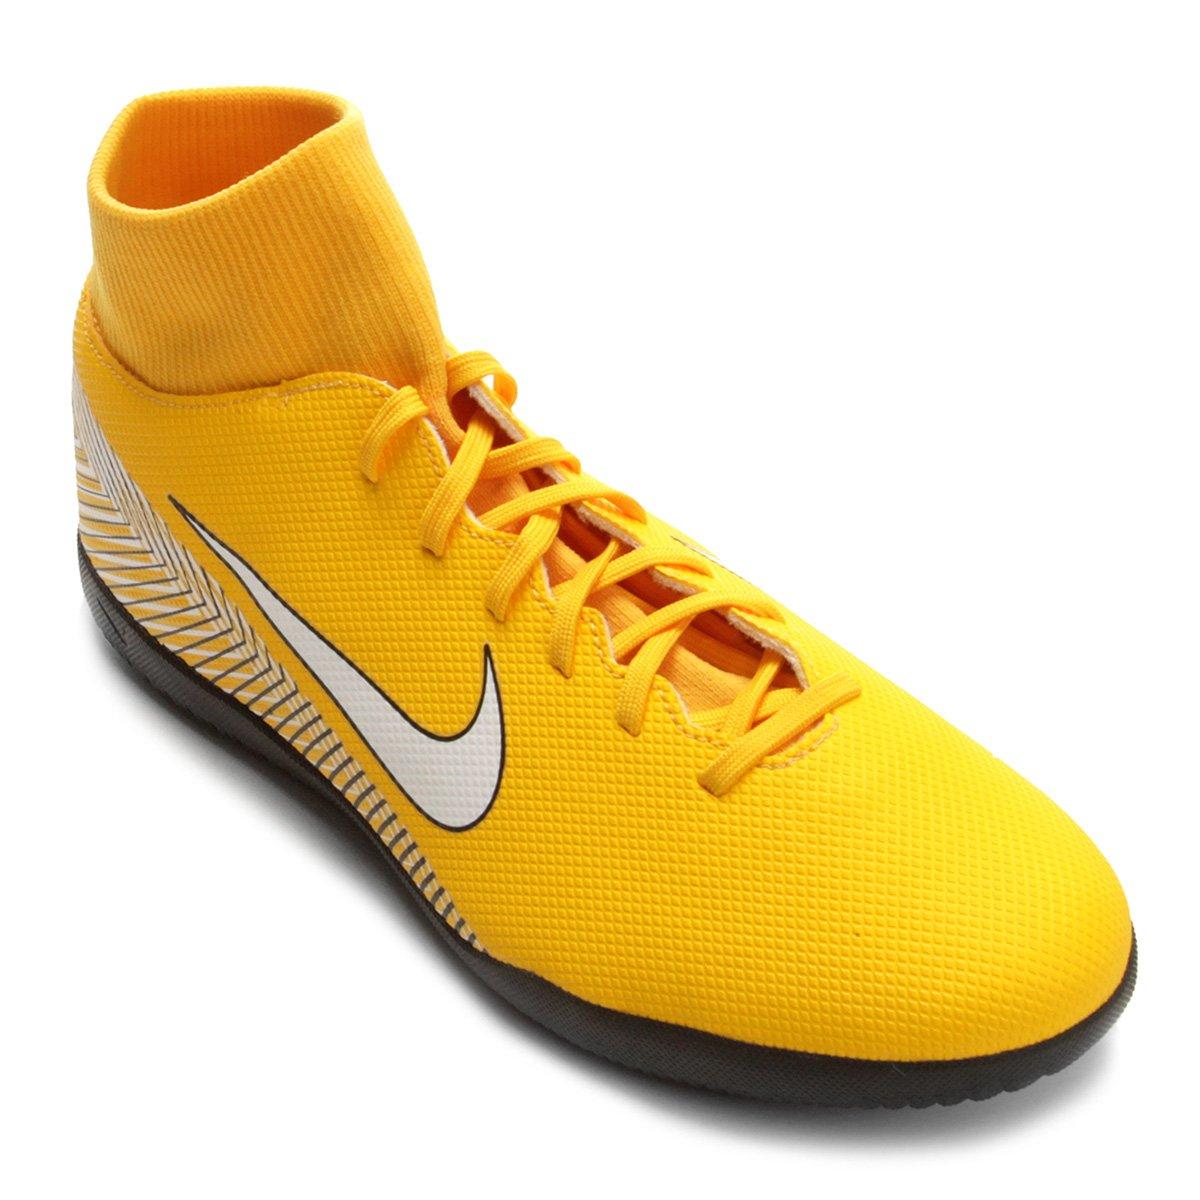 b5b007c963081 Chuteira Futsal Nike Mercurial Superfly 6 Club Neymar IC - Amarelo e Preto  - Compre Agora